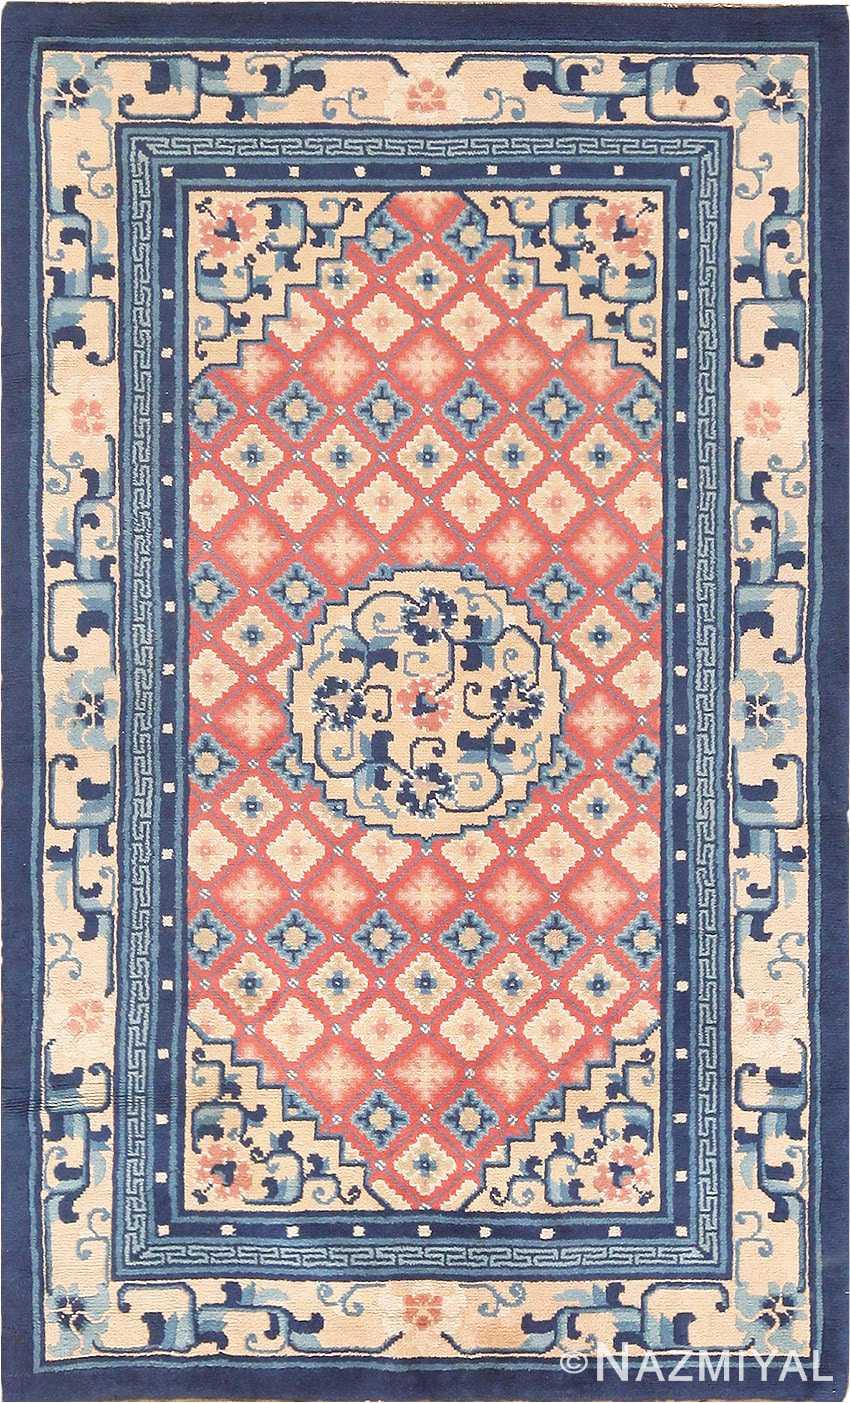 Chinese Rug 49973 Nazmiyal Antique Rugs